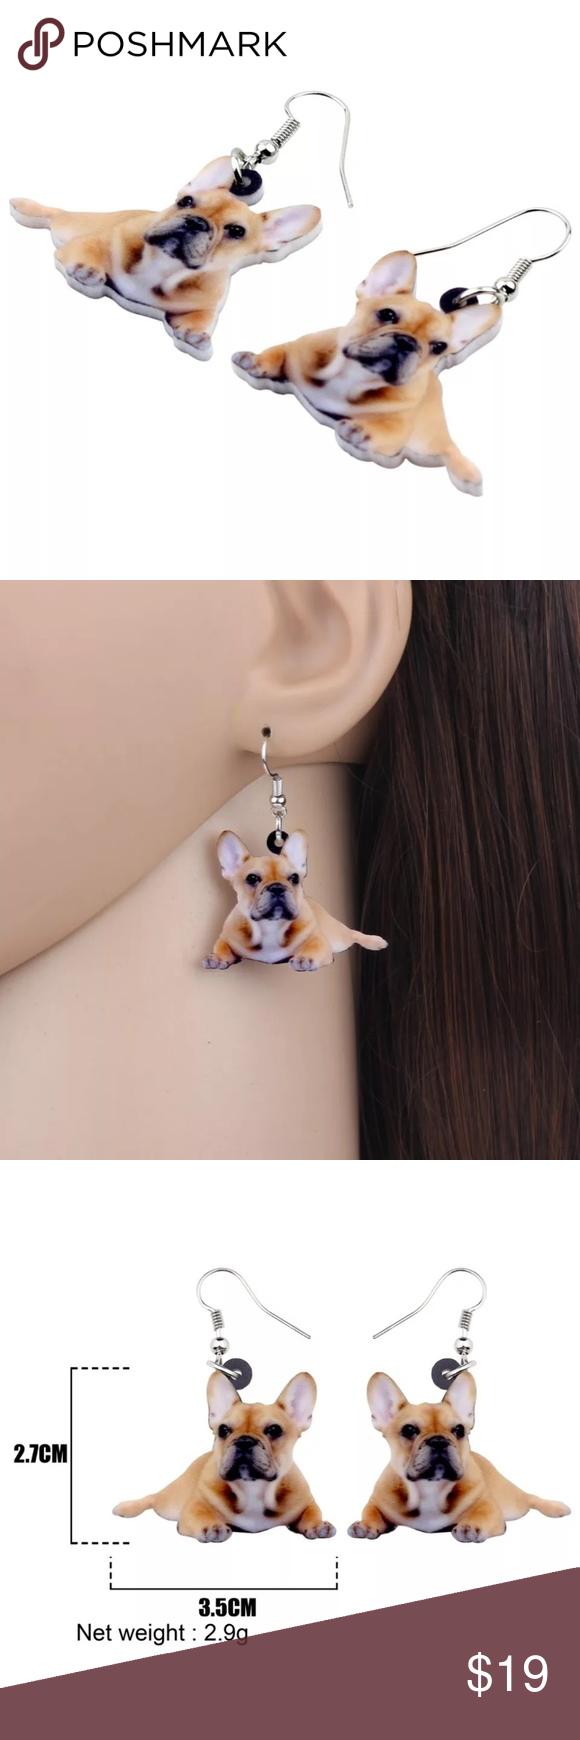 Acrylic Lying French Bulldog Dog Earrings Boutique French Bulldog Dog Dog Earrings Dog Earrings Jewelry